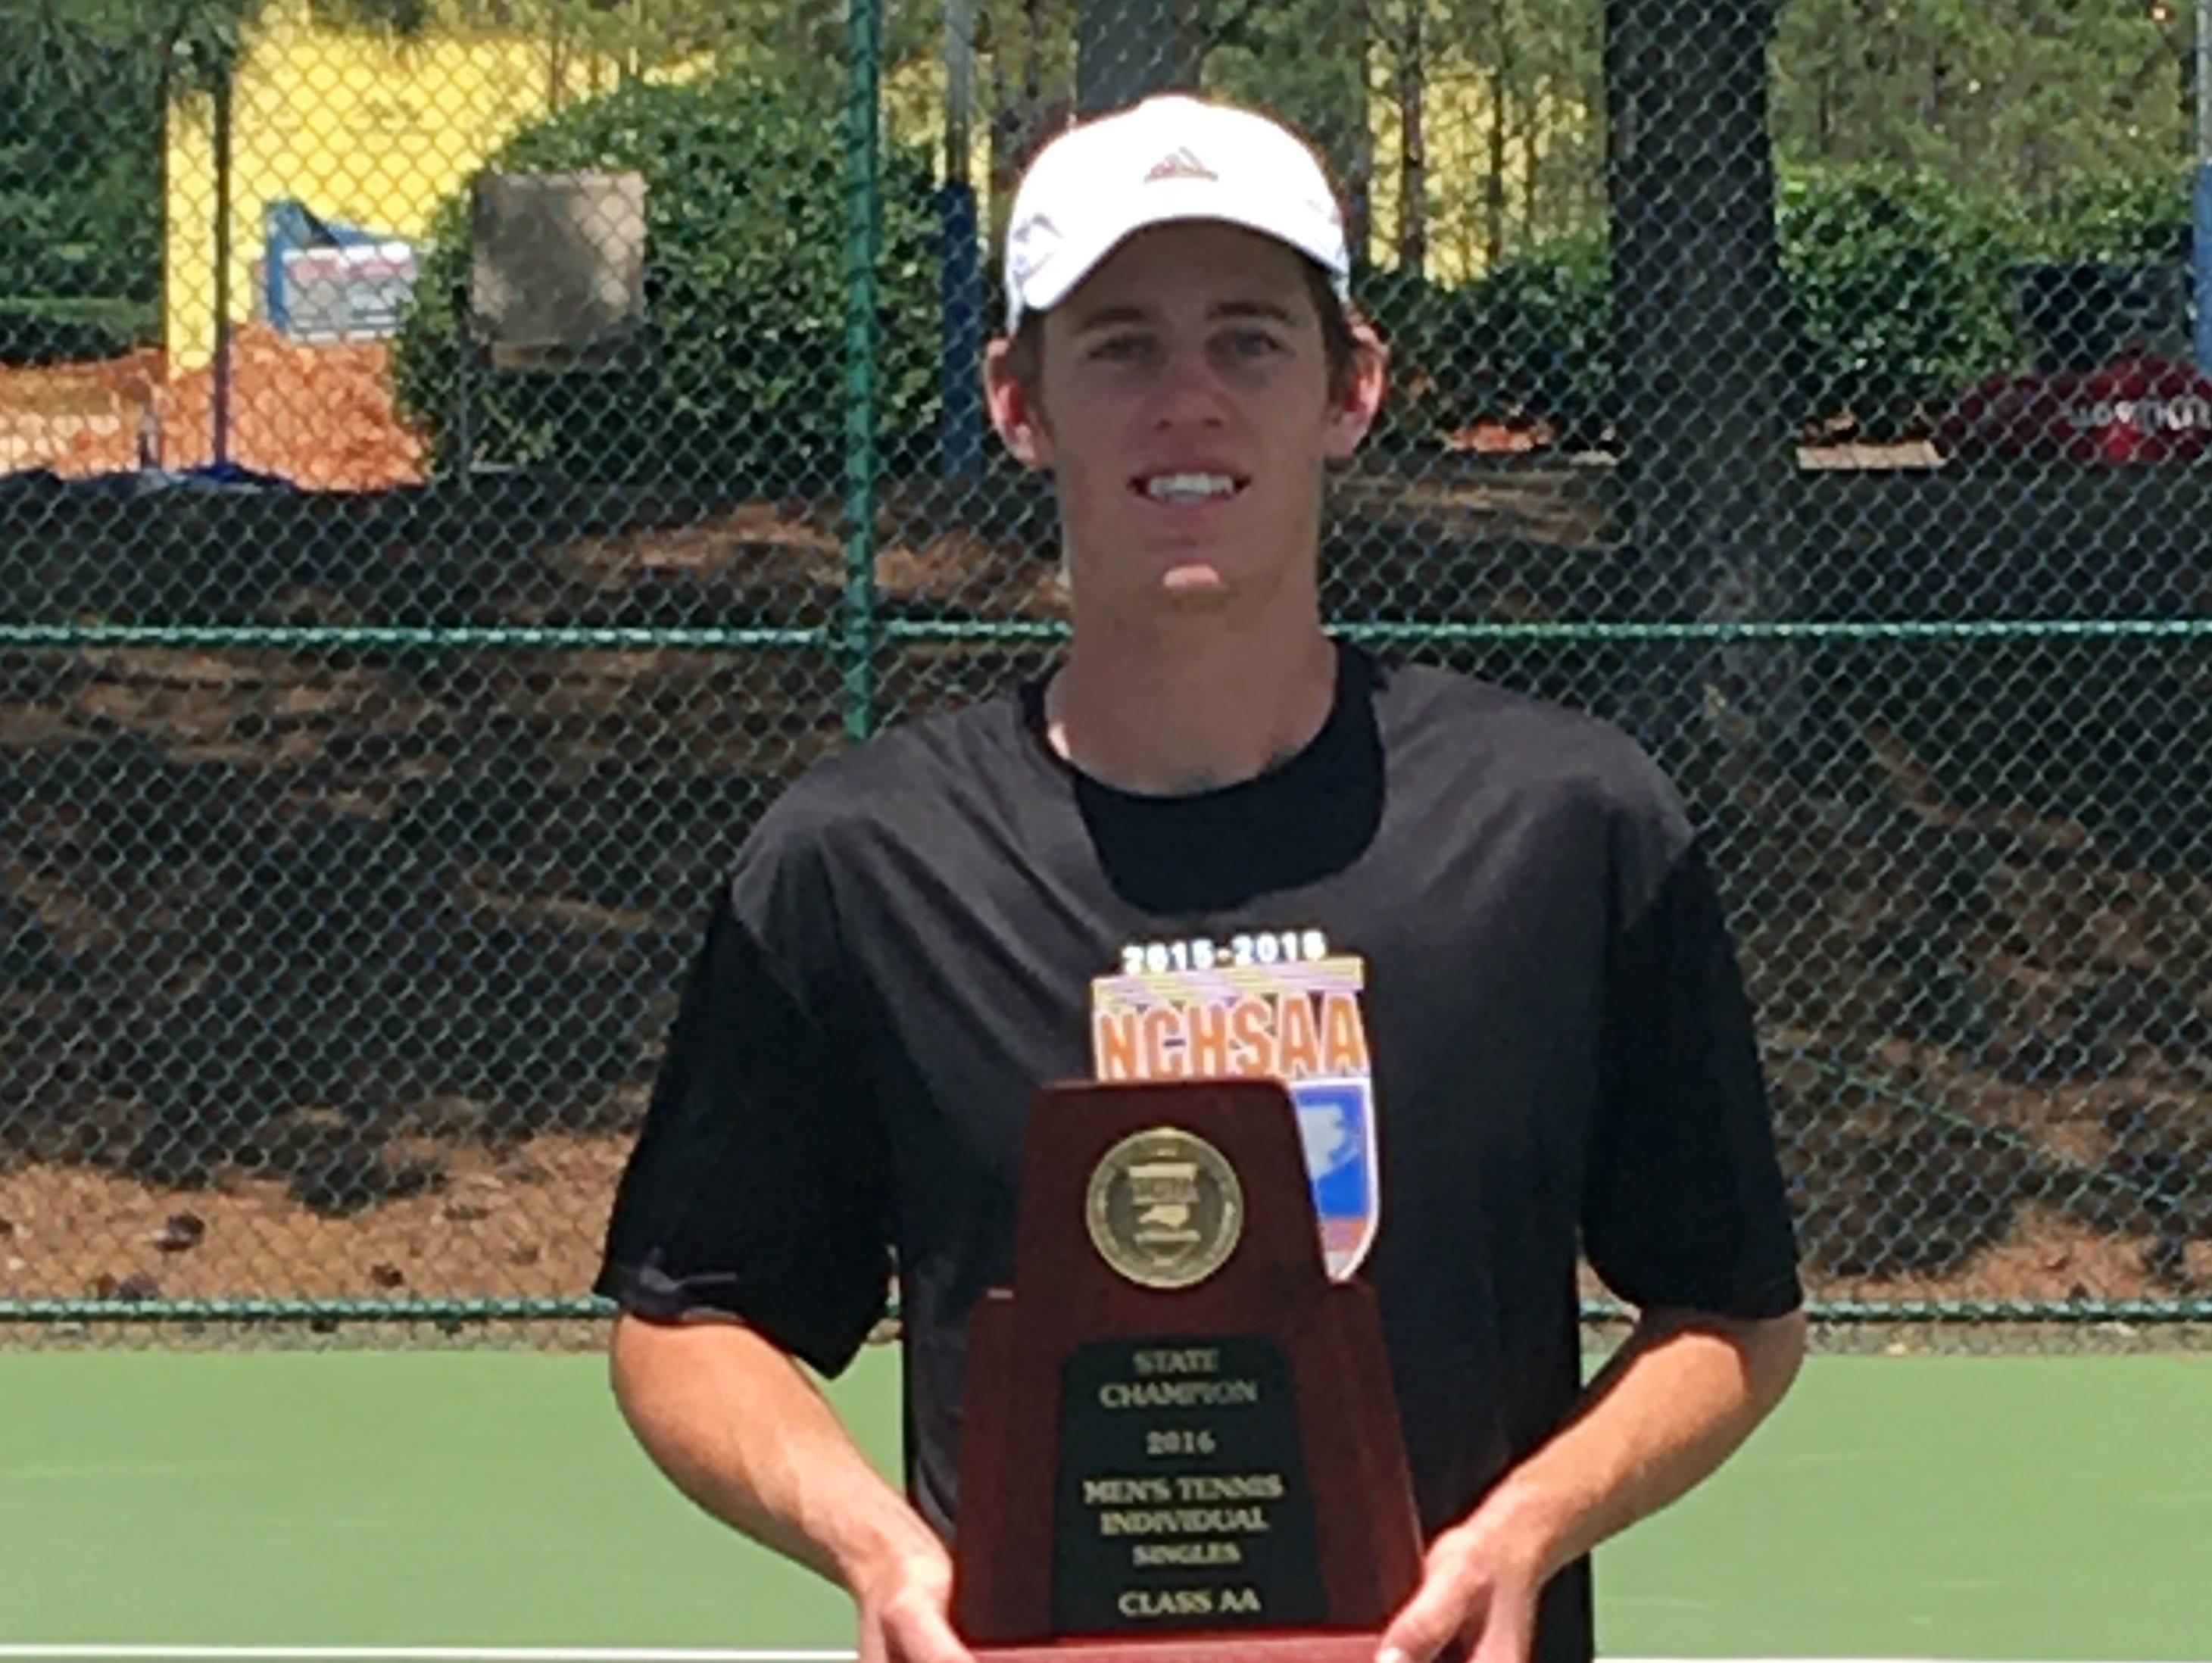 Brevard junior Joseph Schrader won the NCHSAA 2-A tennis championship Saturday in Apex.